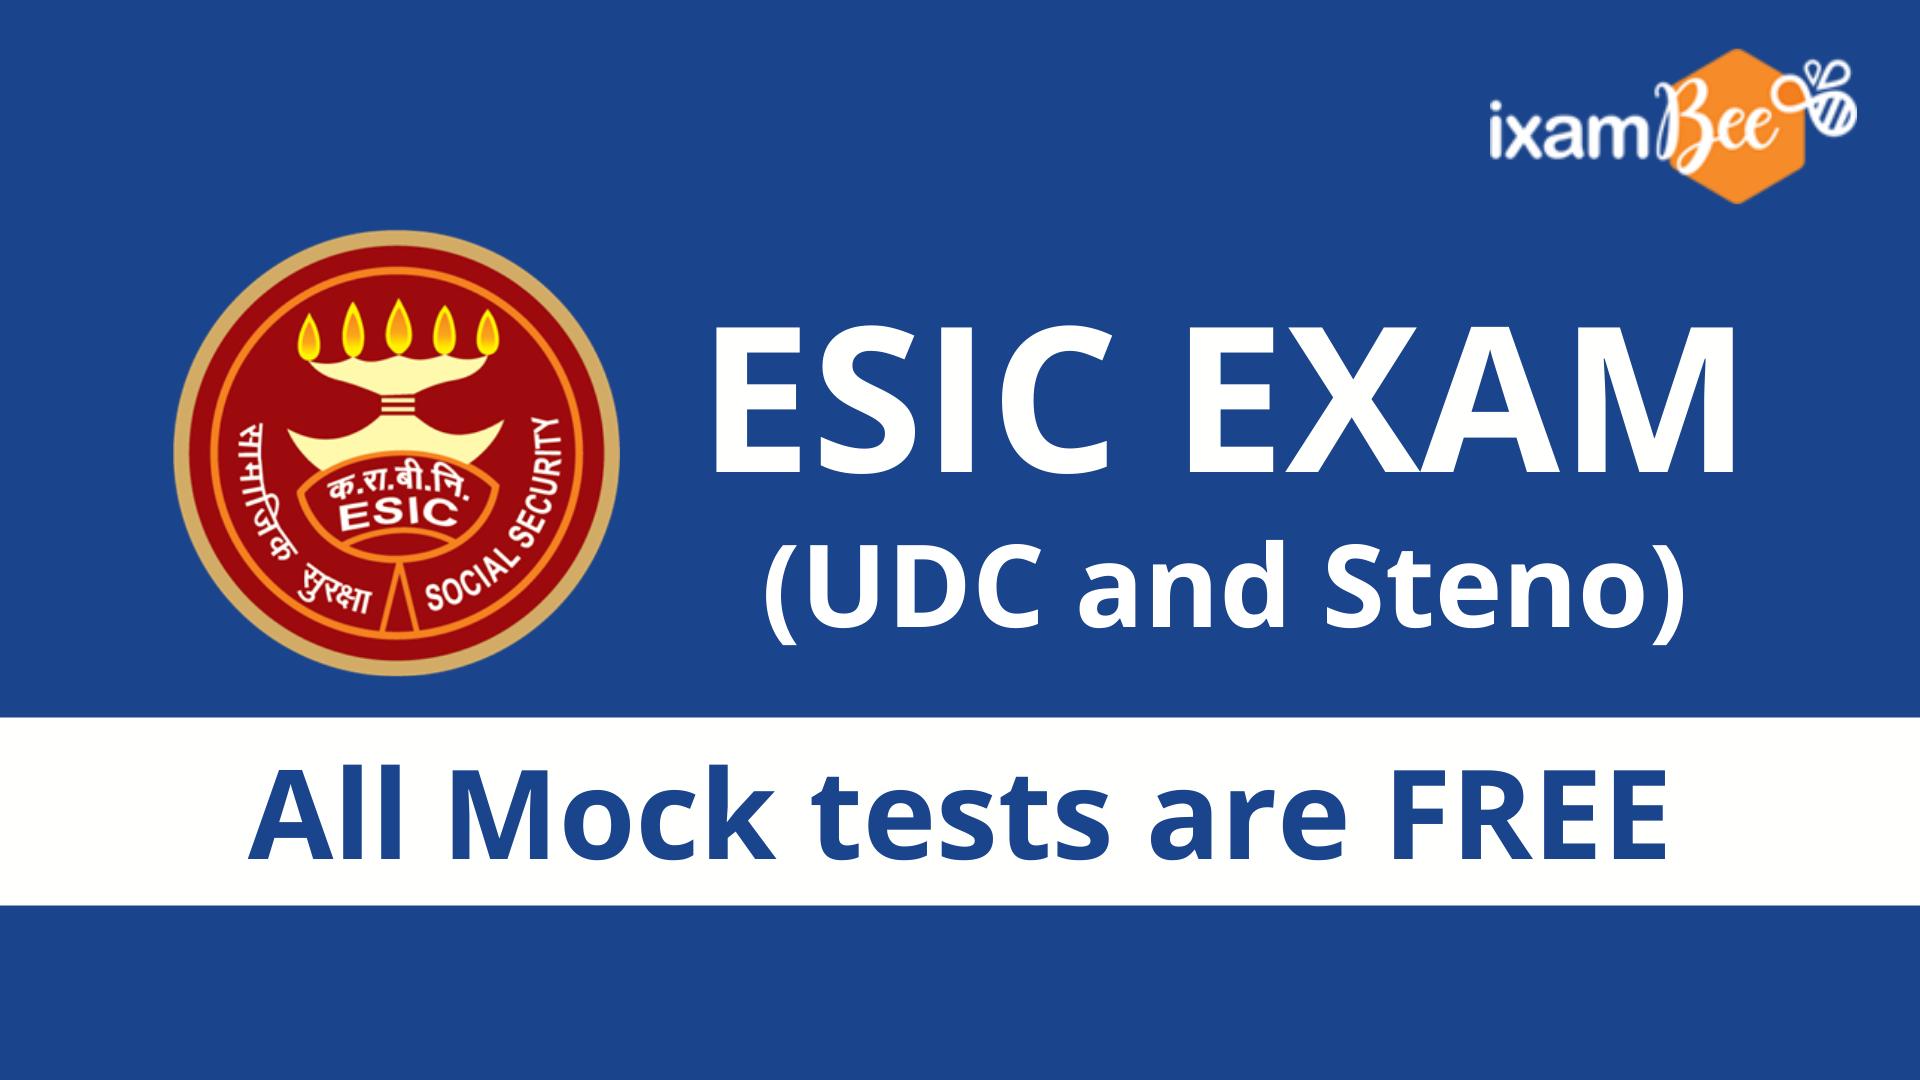 ESIC UDC and Stenographer